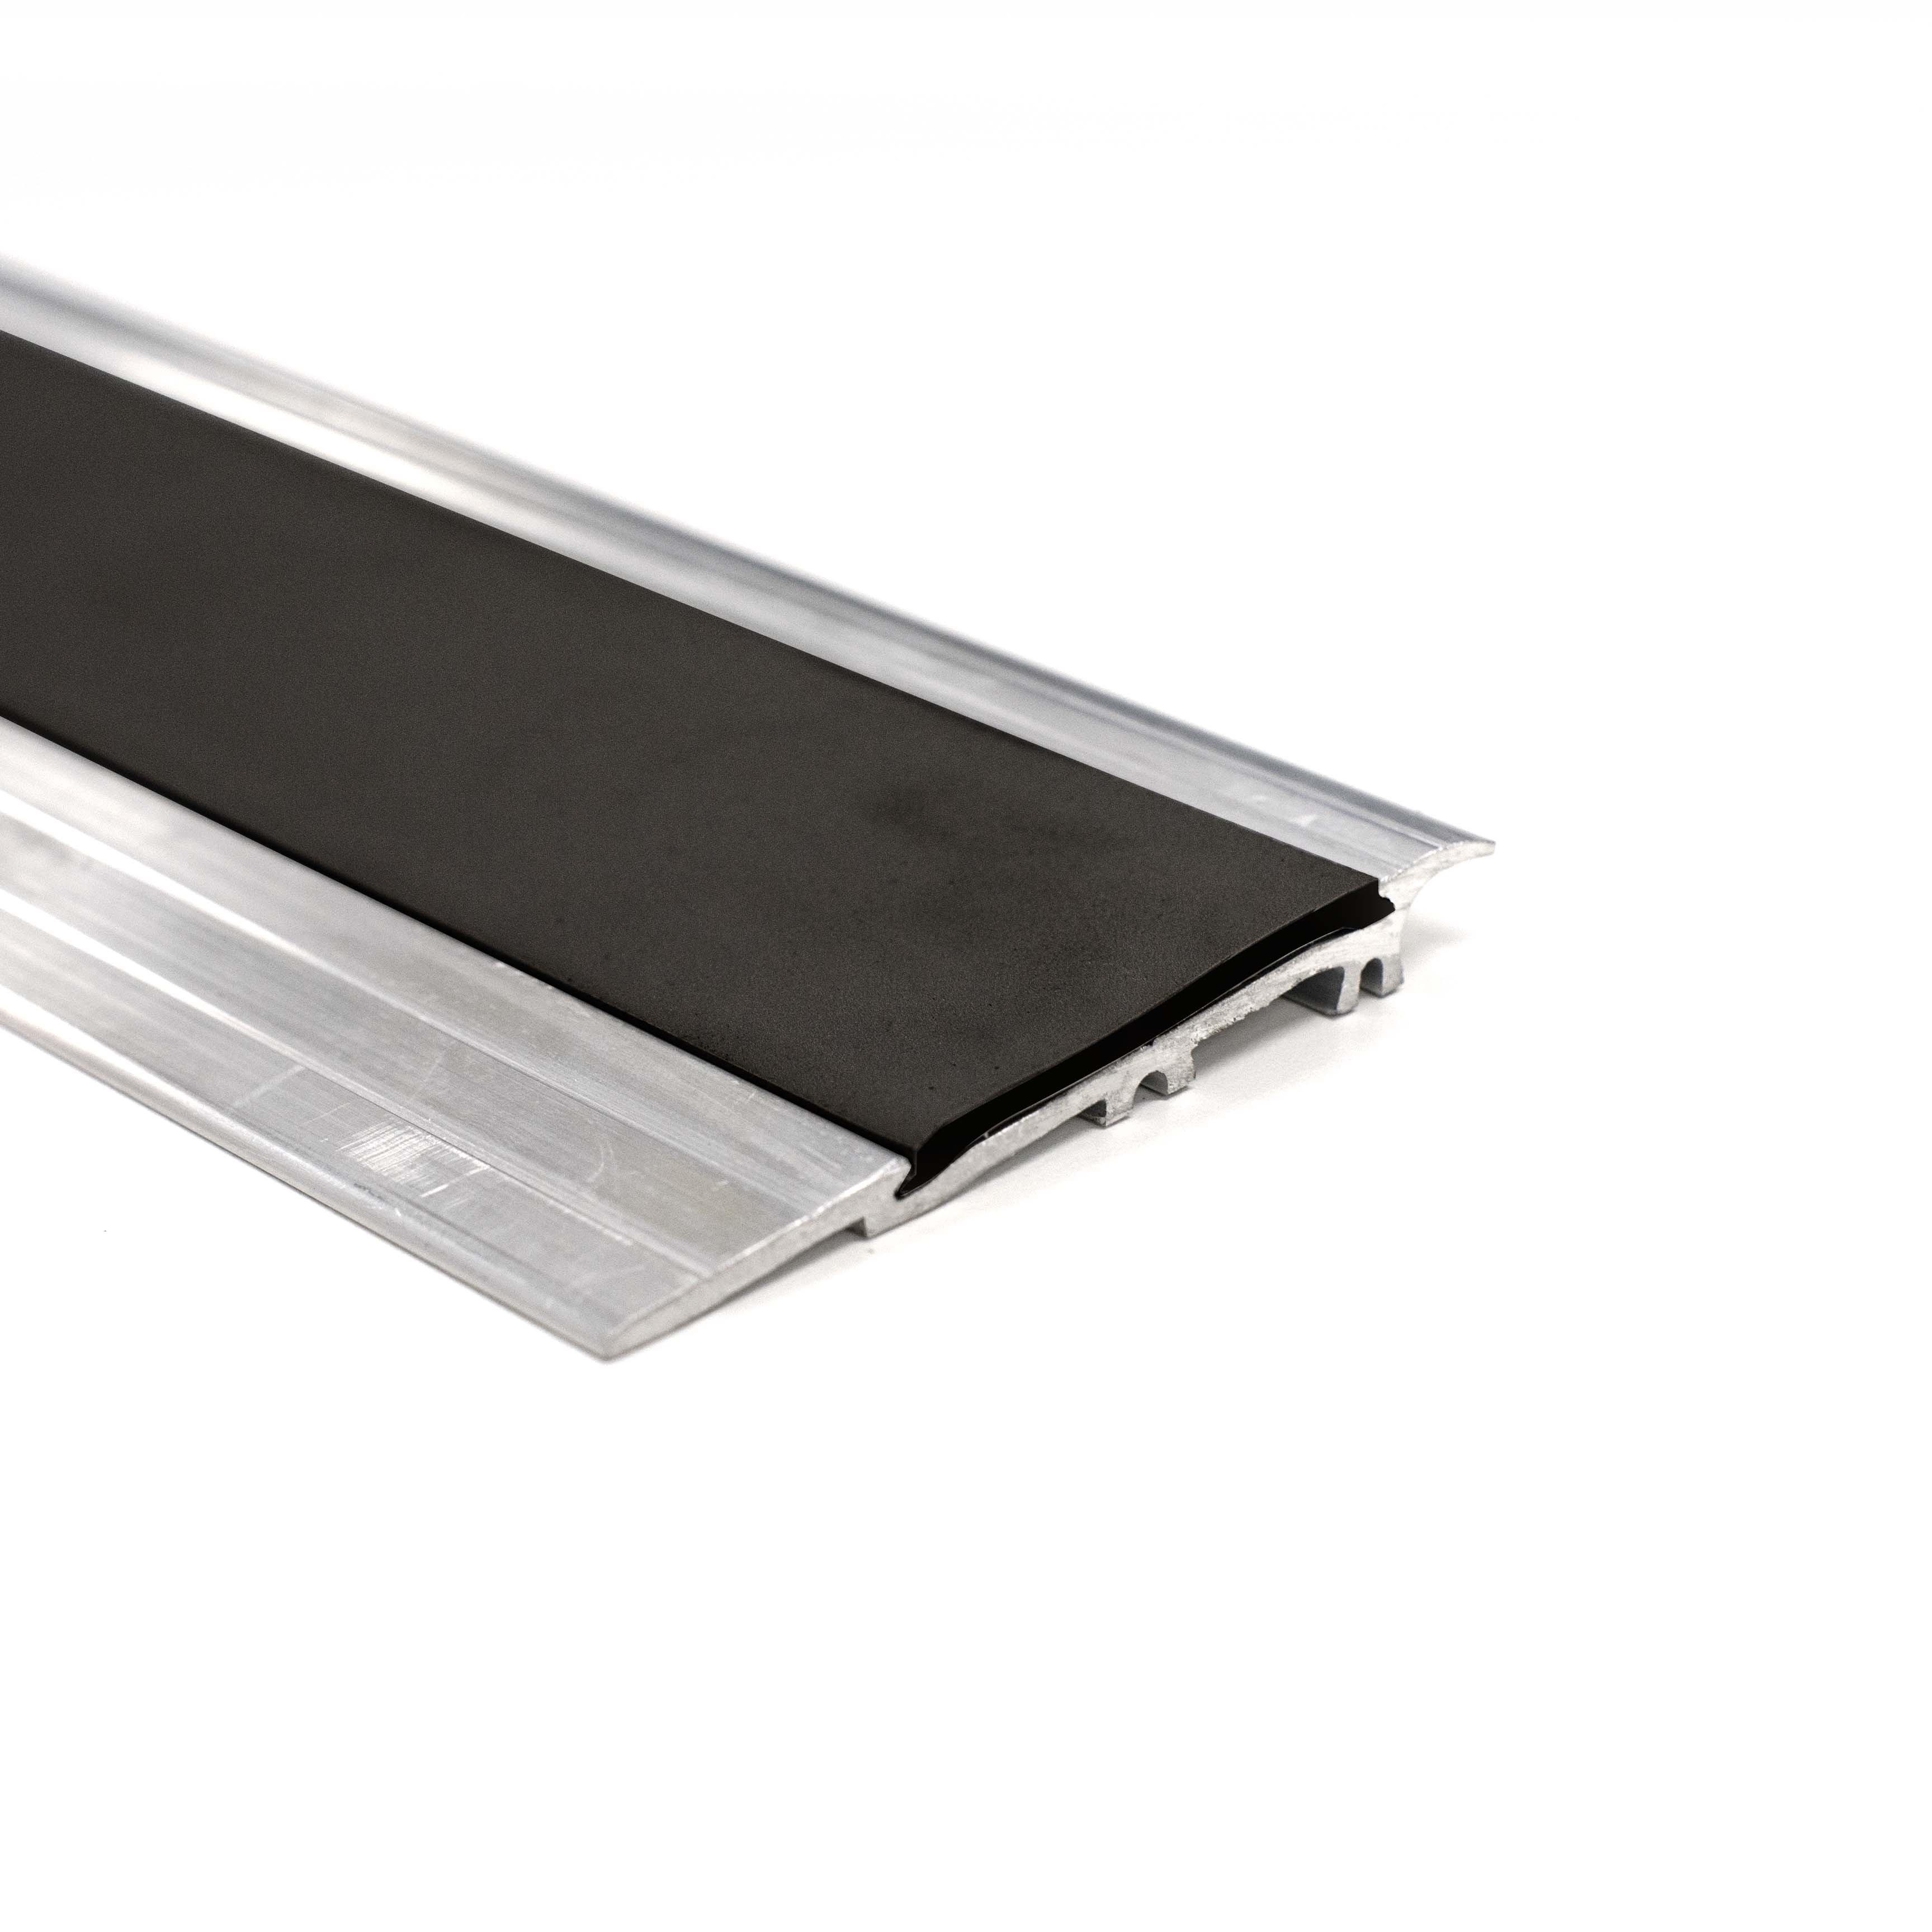 Alumunium Transition Strip For TekTile System with Black Insert - 2.5m